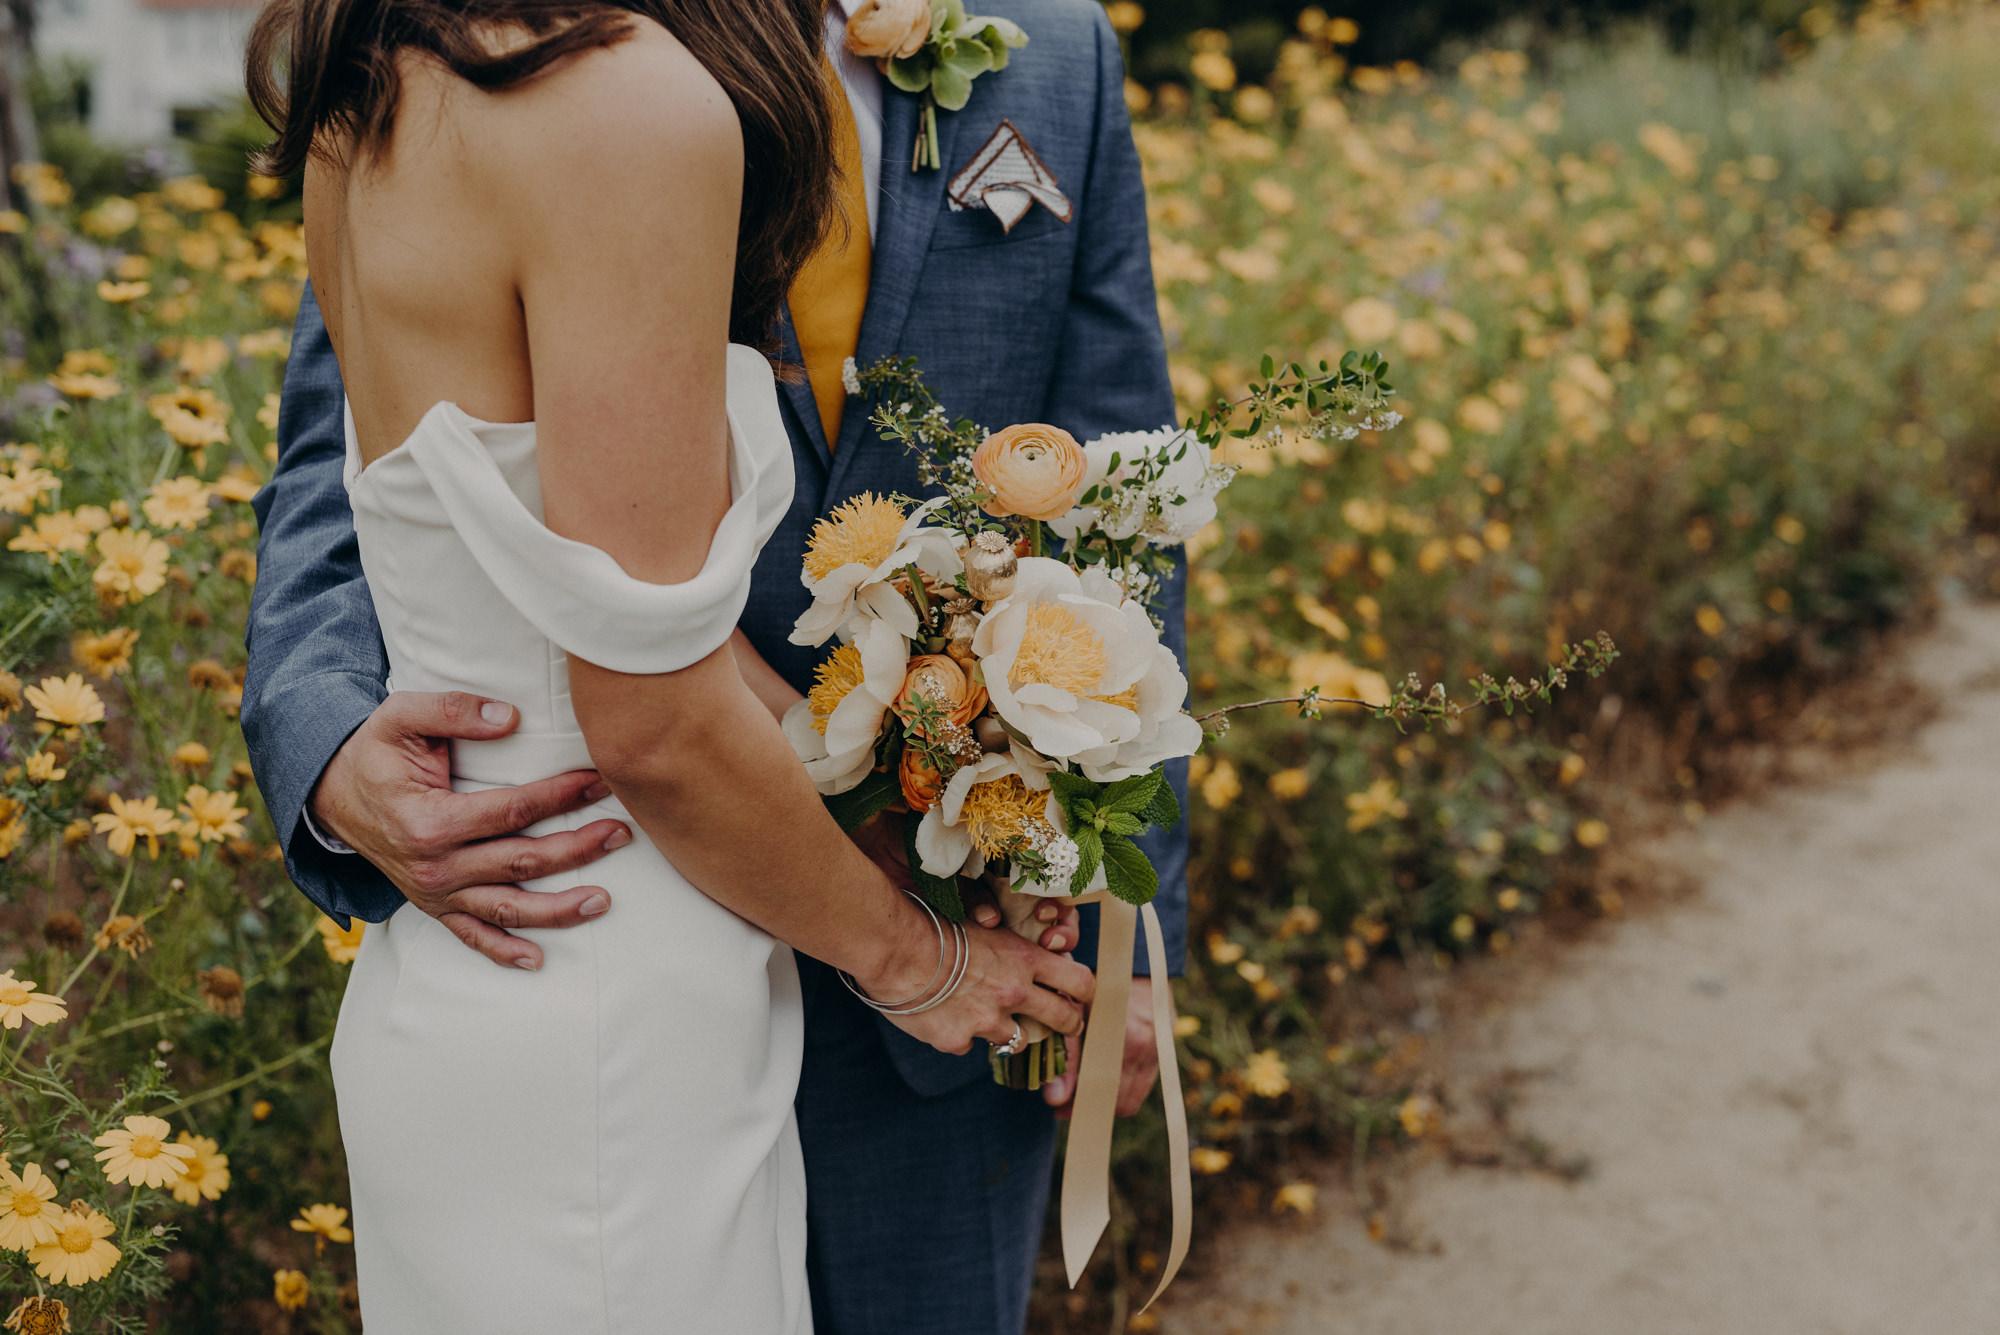 elopement photographer in los angeles - la wedding photographer - isaiahandtaylor.com-016.jpg